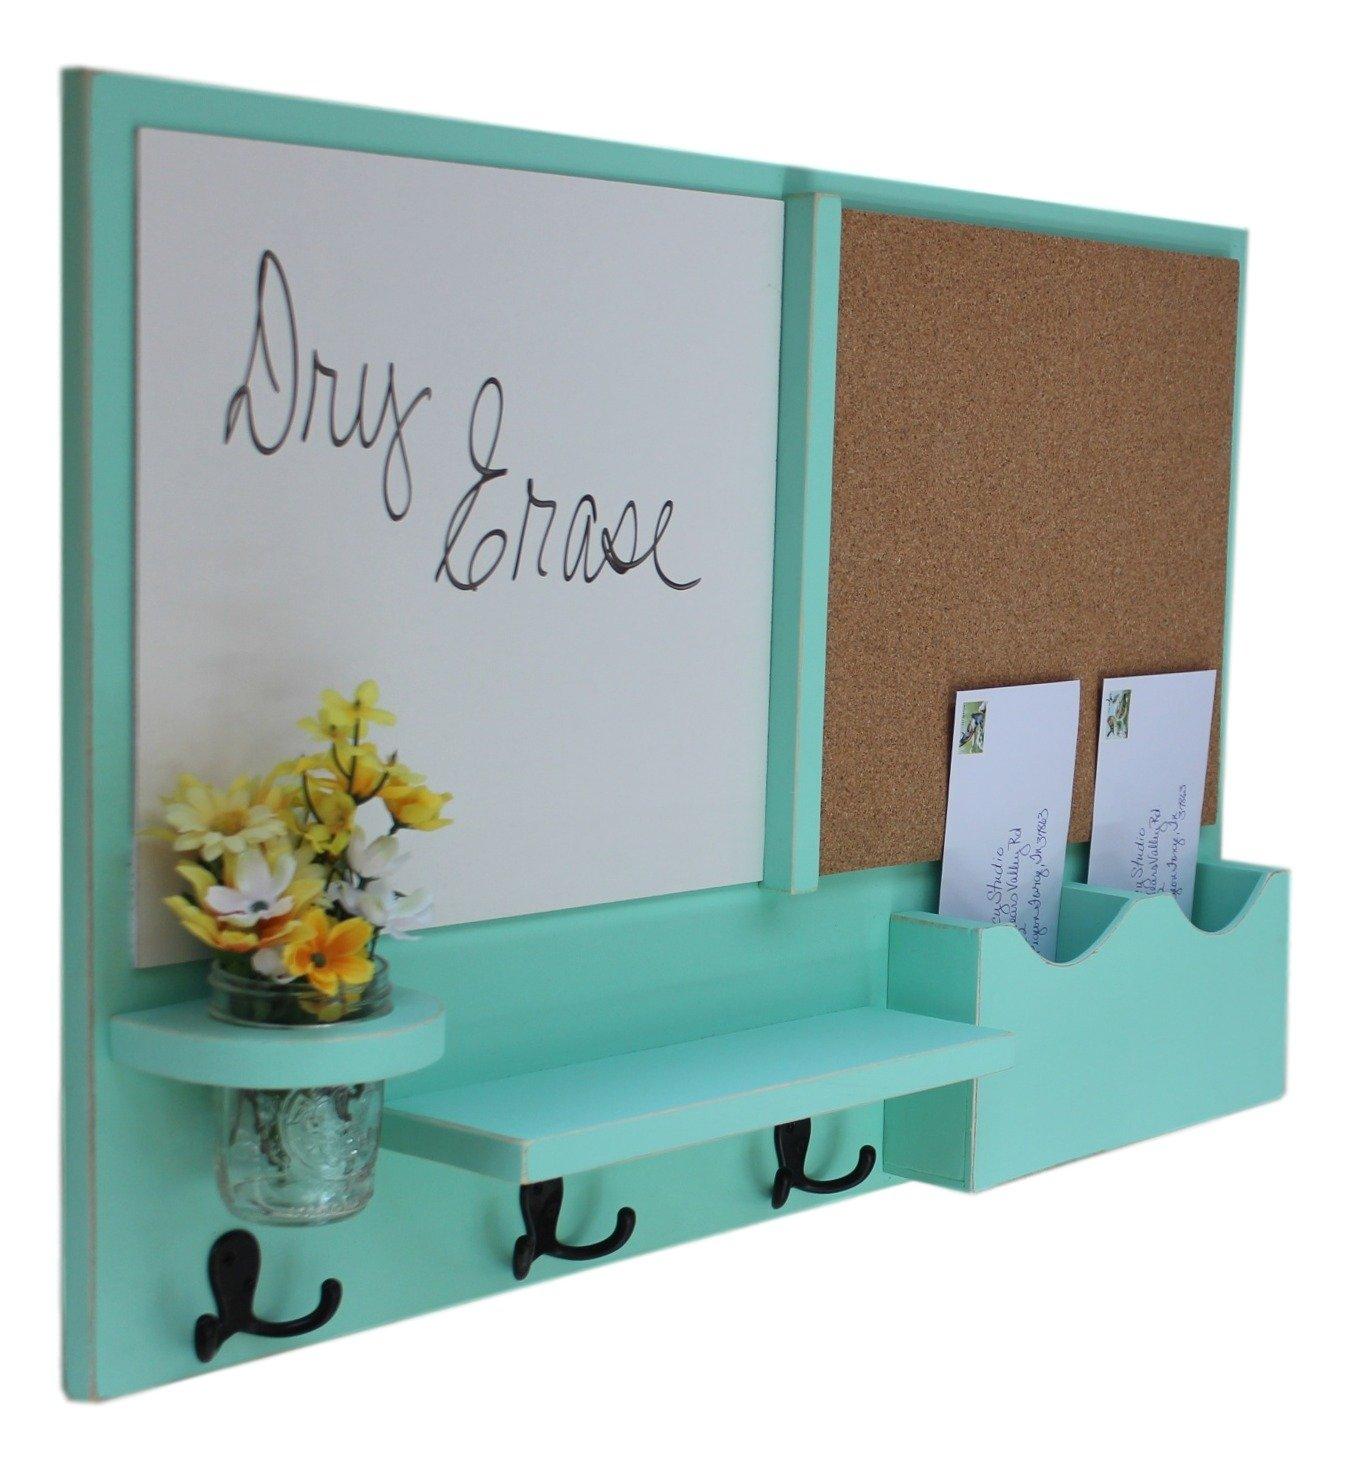 Legacy Studio Décor Message Center with White Board & Cork Board Letter Holder Coat Rack Key Hooks (Distressed, Sea Foam)